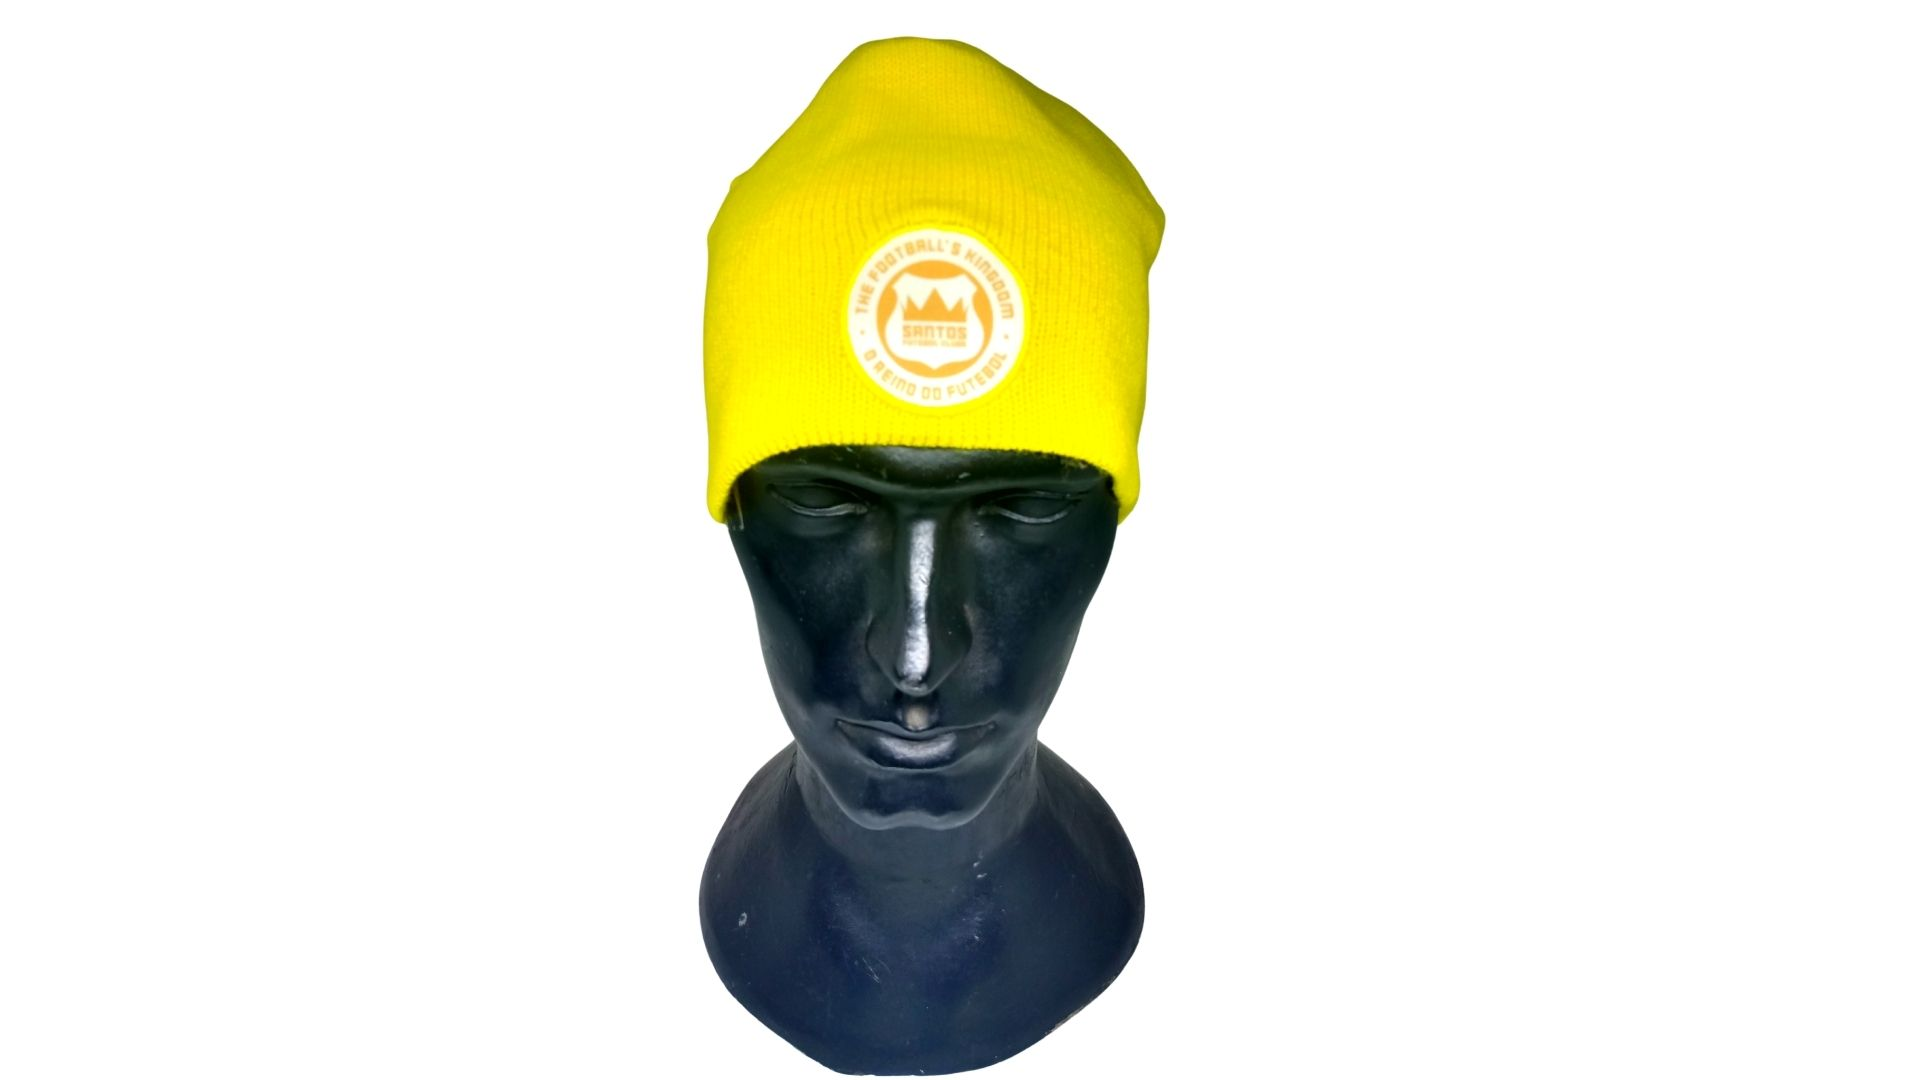 Touca Santos dupla face mlk zica - amarela